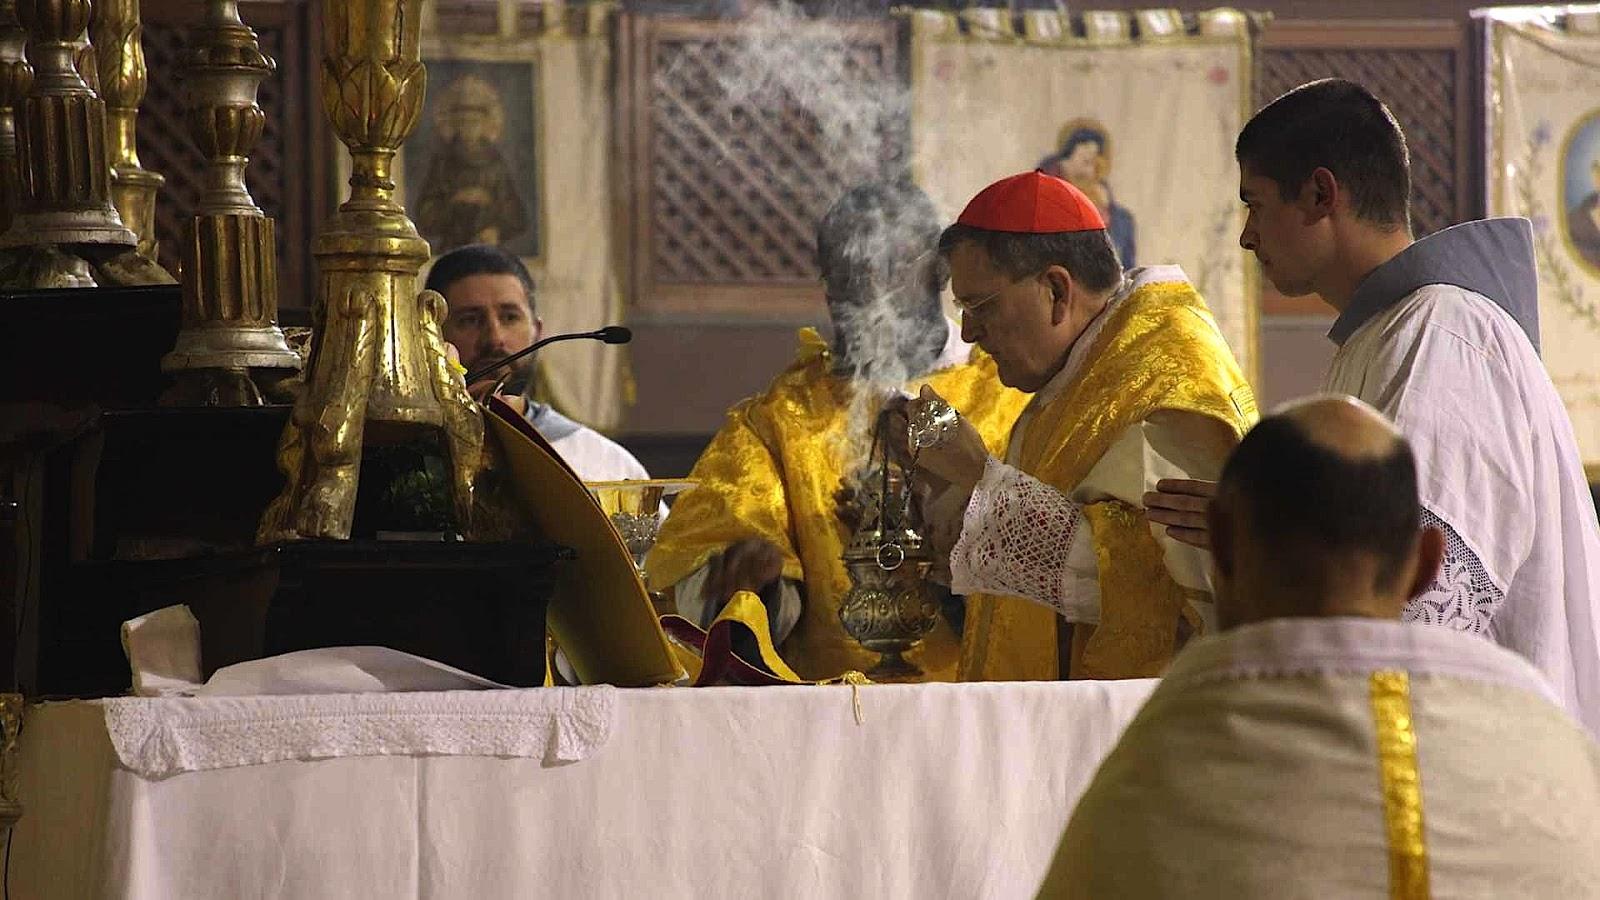 http://1.bp.blogspot.com/-1ySqvo11ID4/UTTRW8lsKZI/AAAAAAAAFJA/MVf_VudE7b4/s1600/Burke+celebrating+Latin+mass.jpg